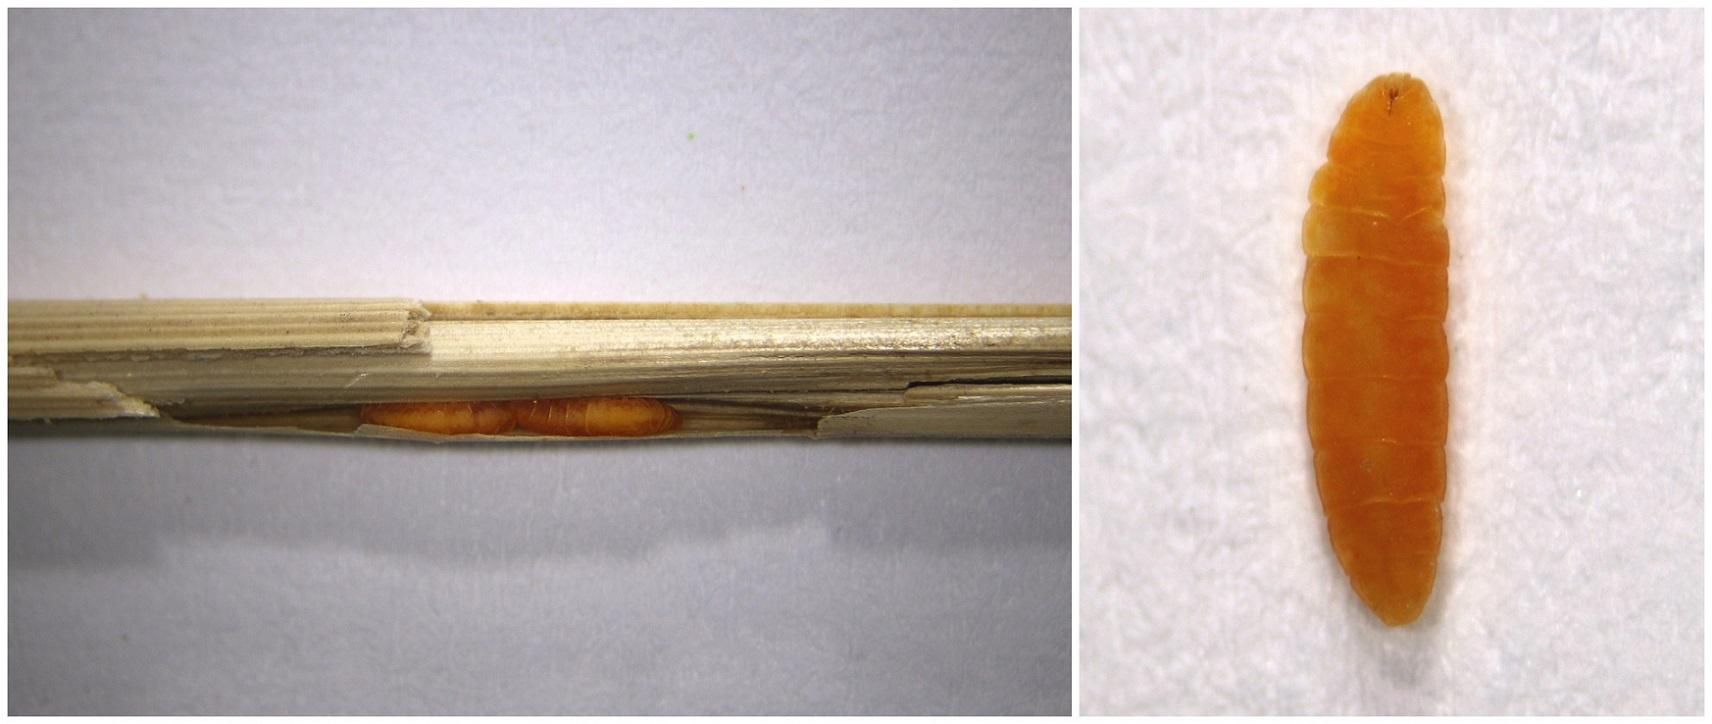 Lasioptera calamagrostidis